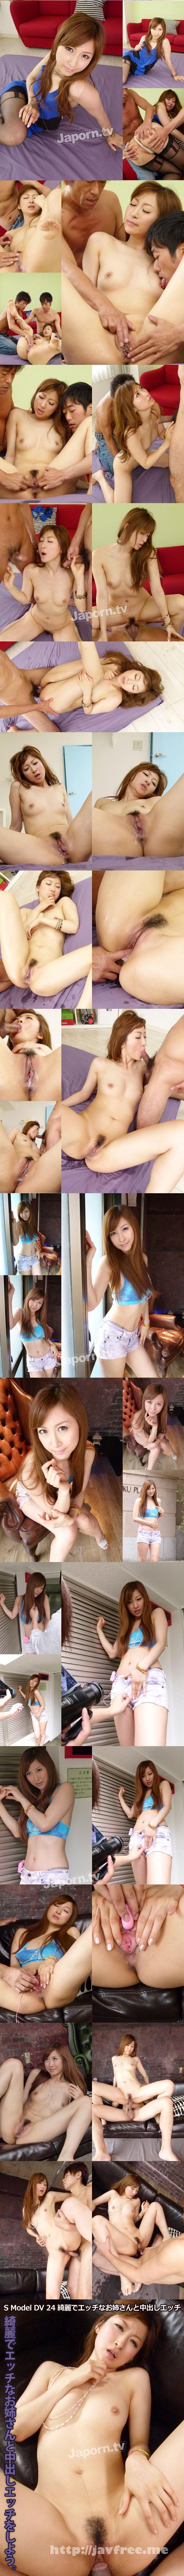 [SMDV-24] S Model DV 24 綺麗でエッチなお姉さんと中出しエッチ : 愛咲れいら - image SMDV-24b on https://javfree.me